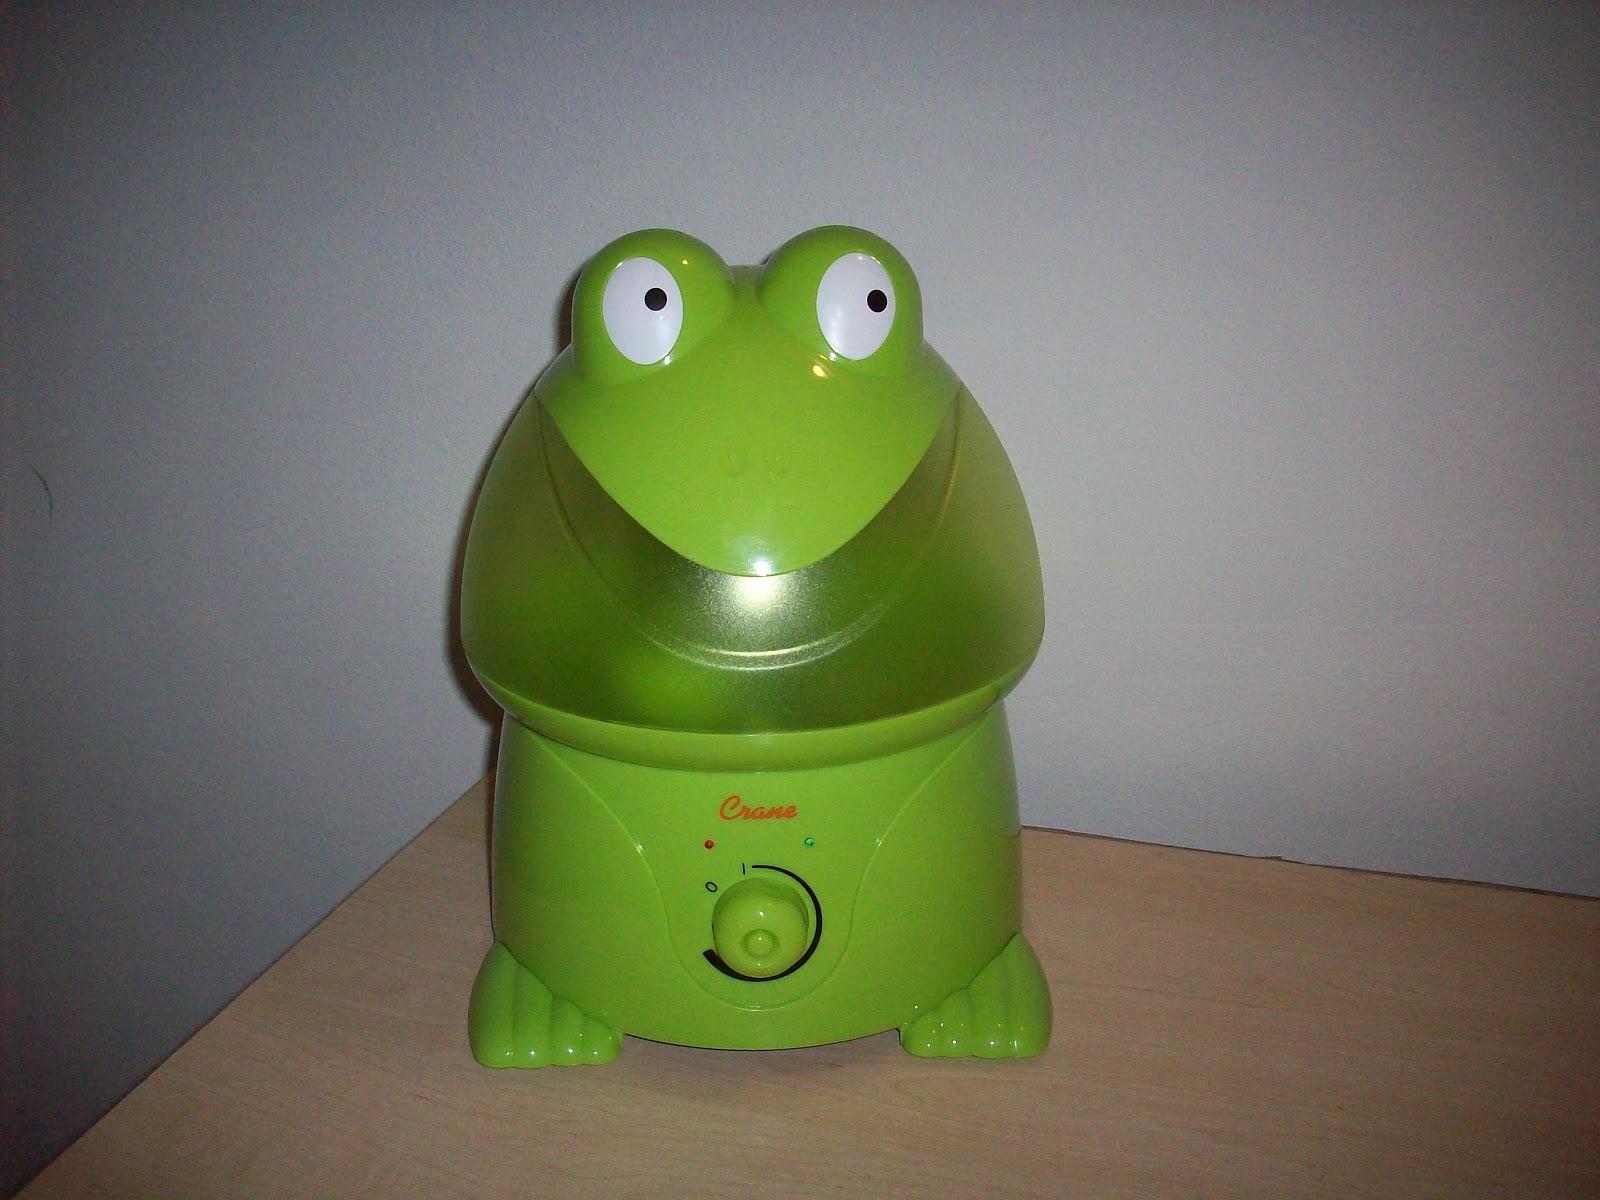 Kerrific Online: Crane Frog Humidifier Review #496717